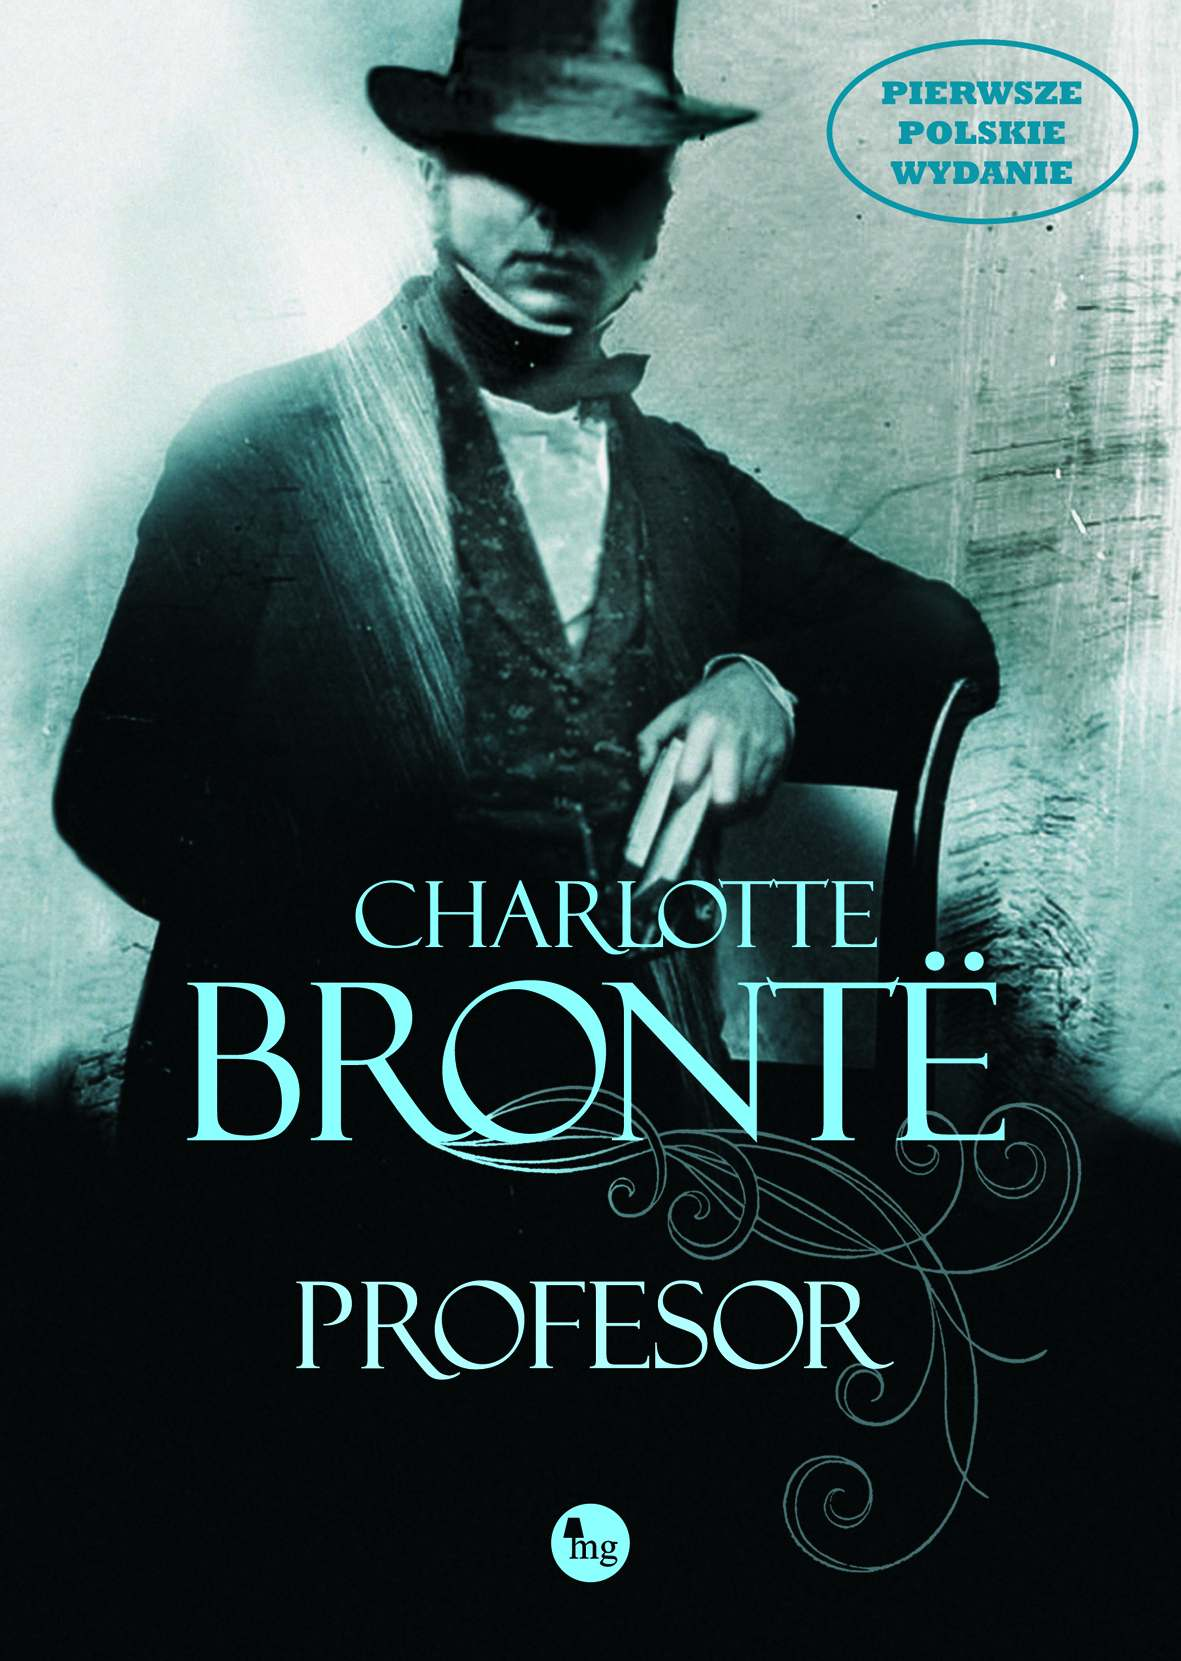 Profesor - Ebook (Książka na Kindle) do pobrania w formacie MOBI